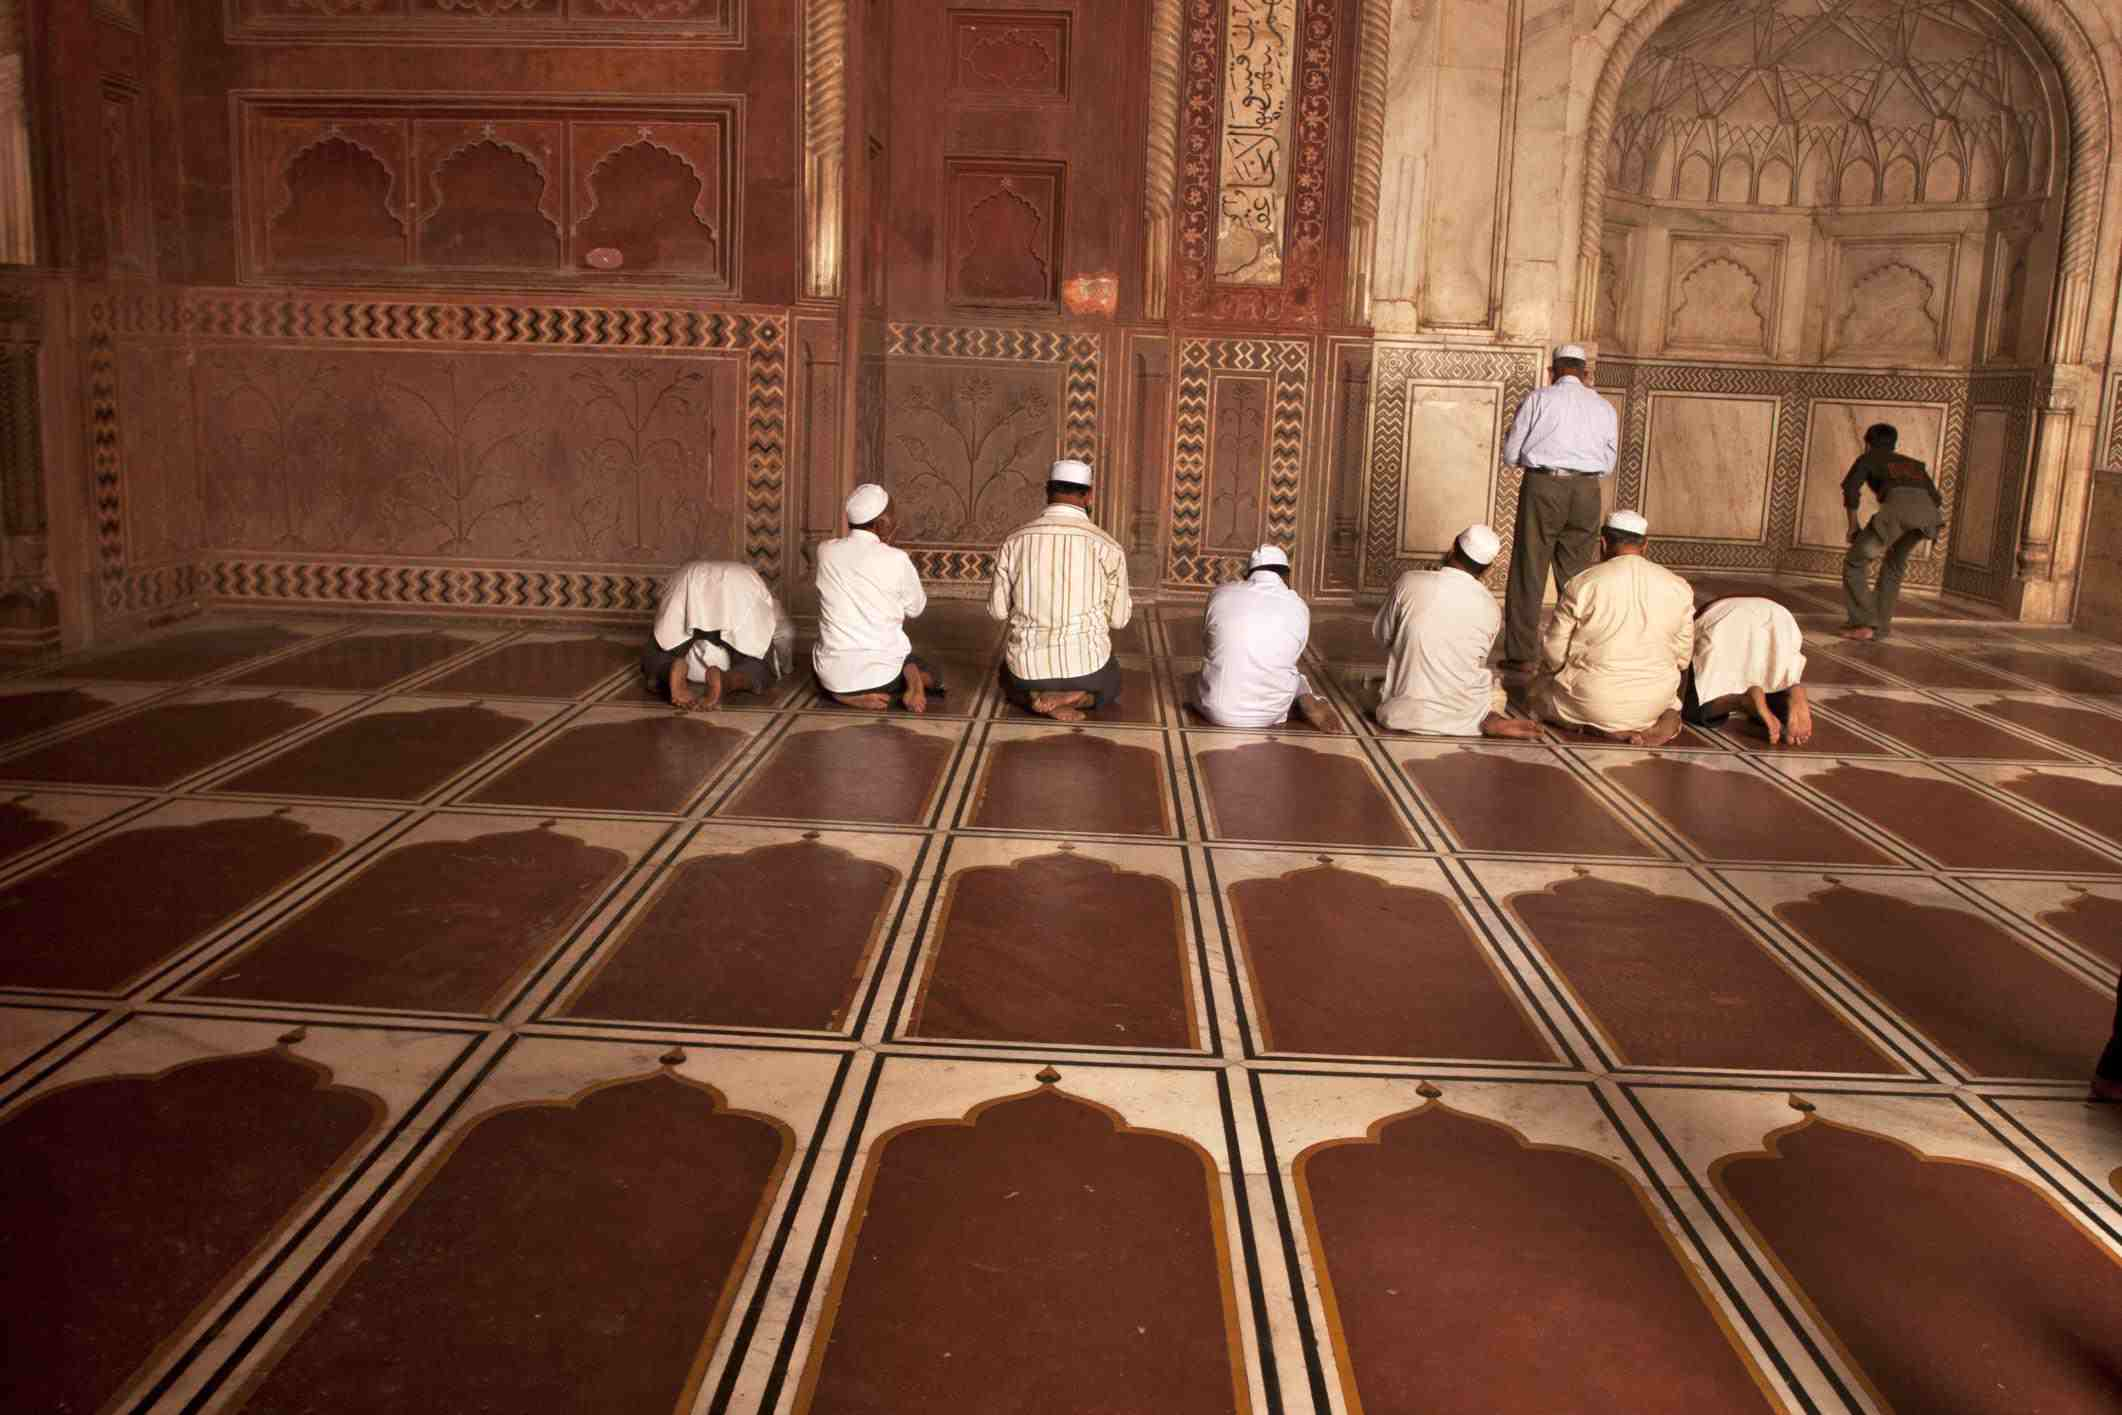 Muslims offer prayer inside Taj Mahal